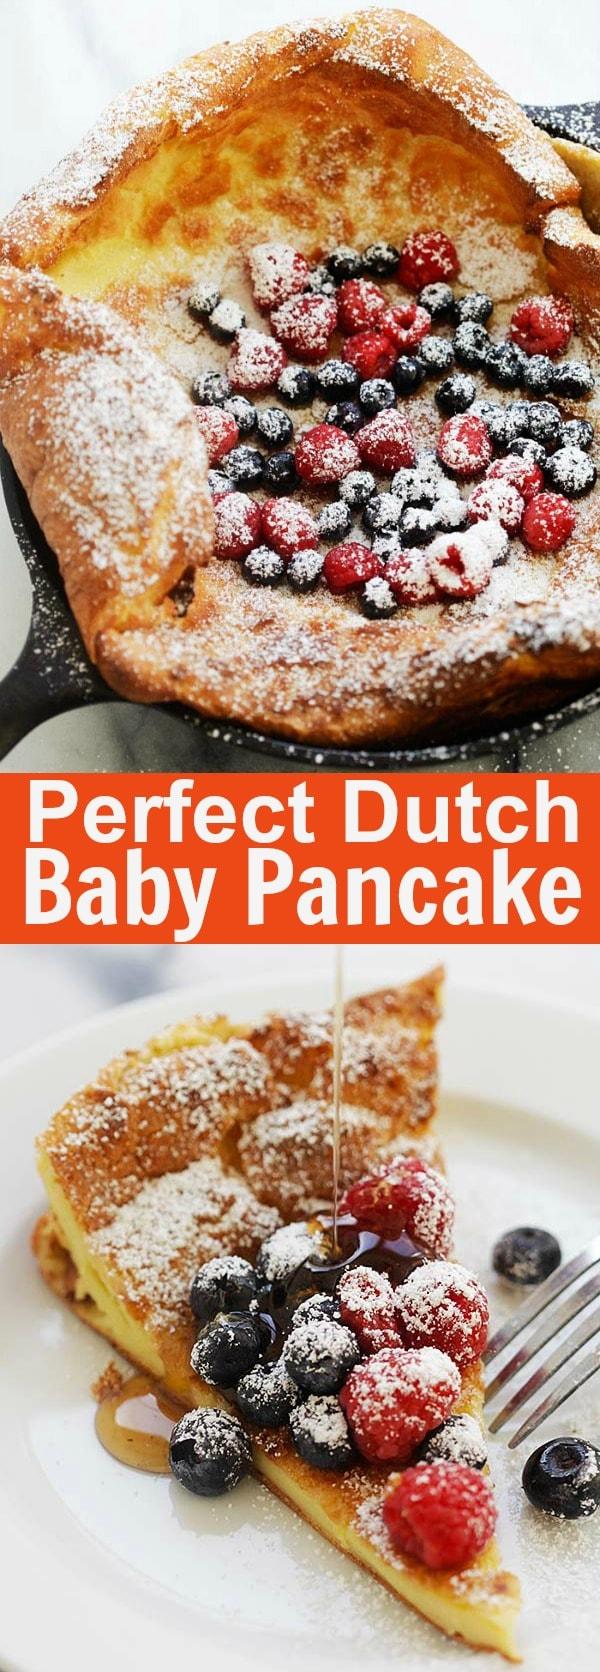 Dutch Baby - Dutch Baby Pancake - Rasa Malaysia